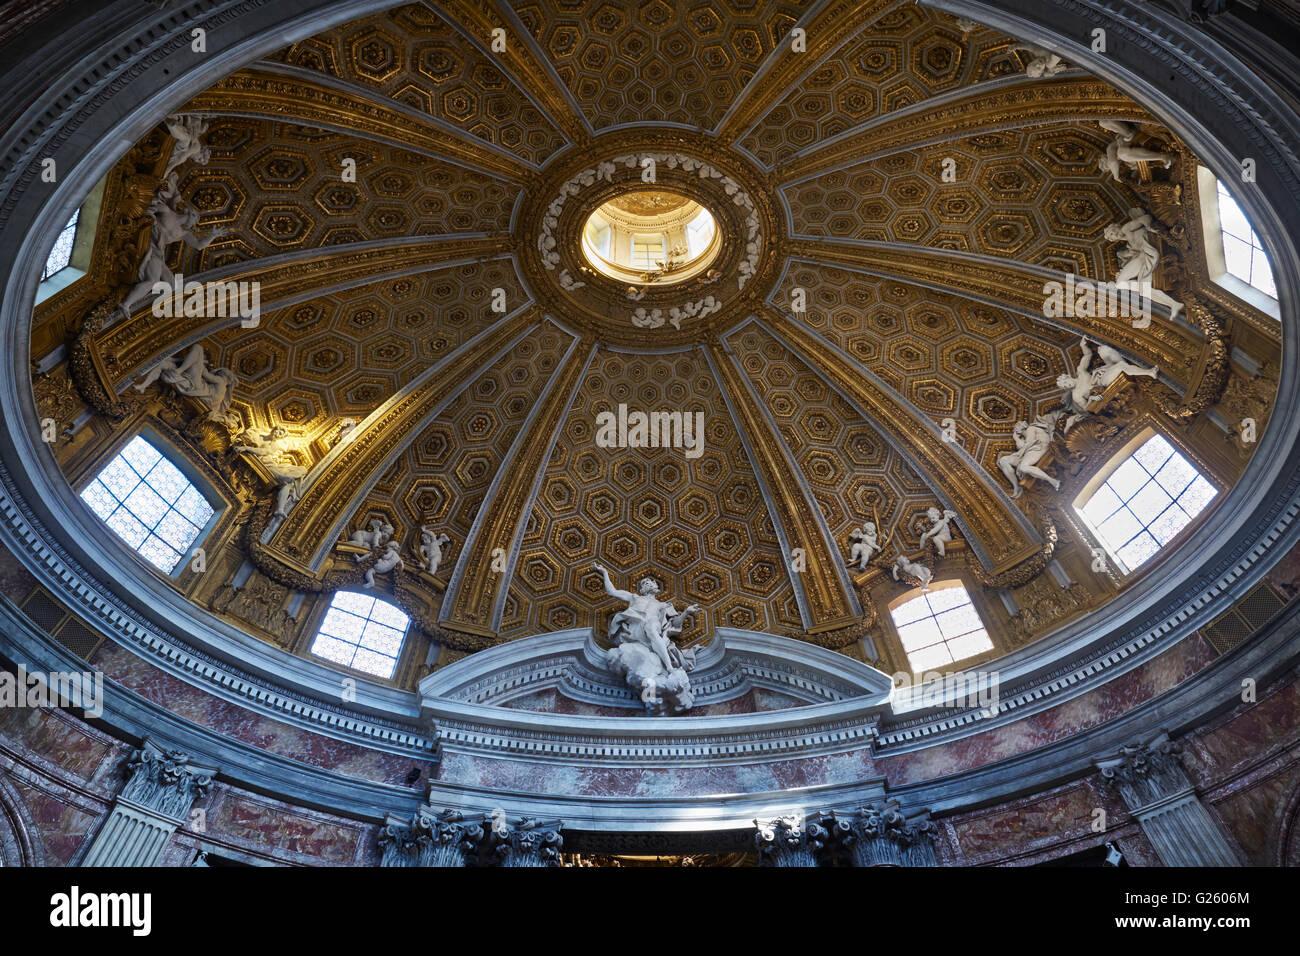 Rome, Sant'Andrea al Quirinale, interior of oval dome with gilded coffering, by Gianlorenzo Bernini, 1658-1670. - Stock Image